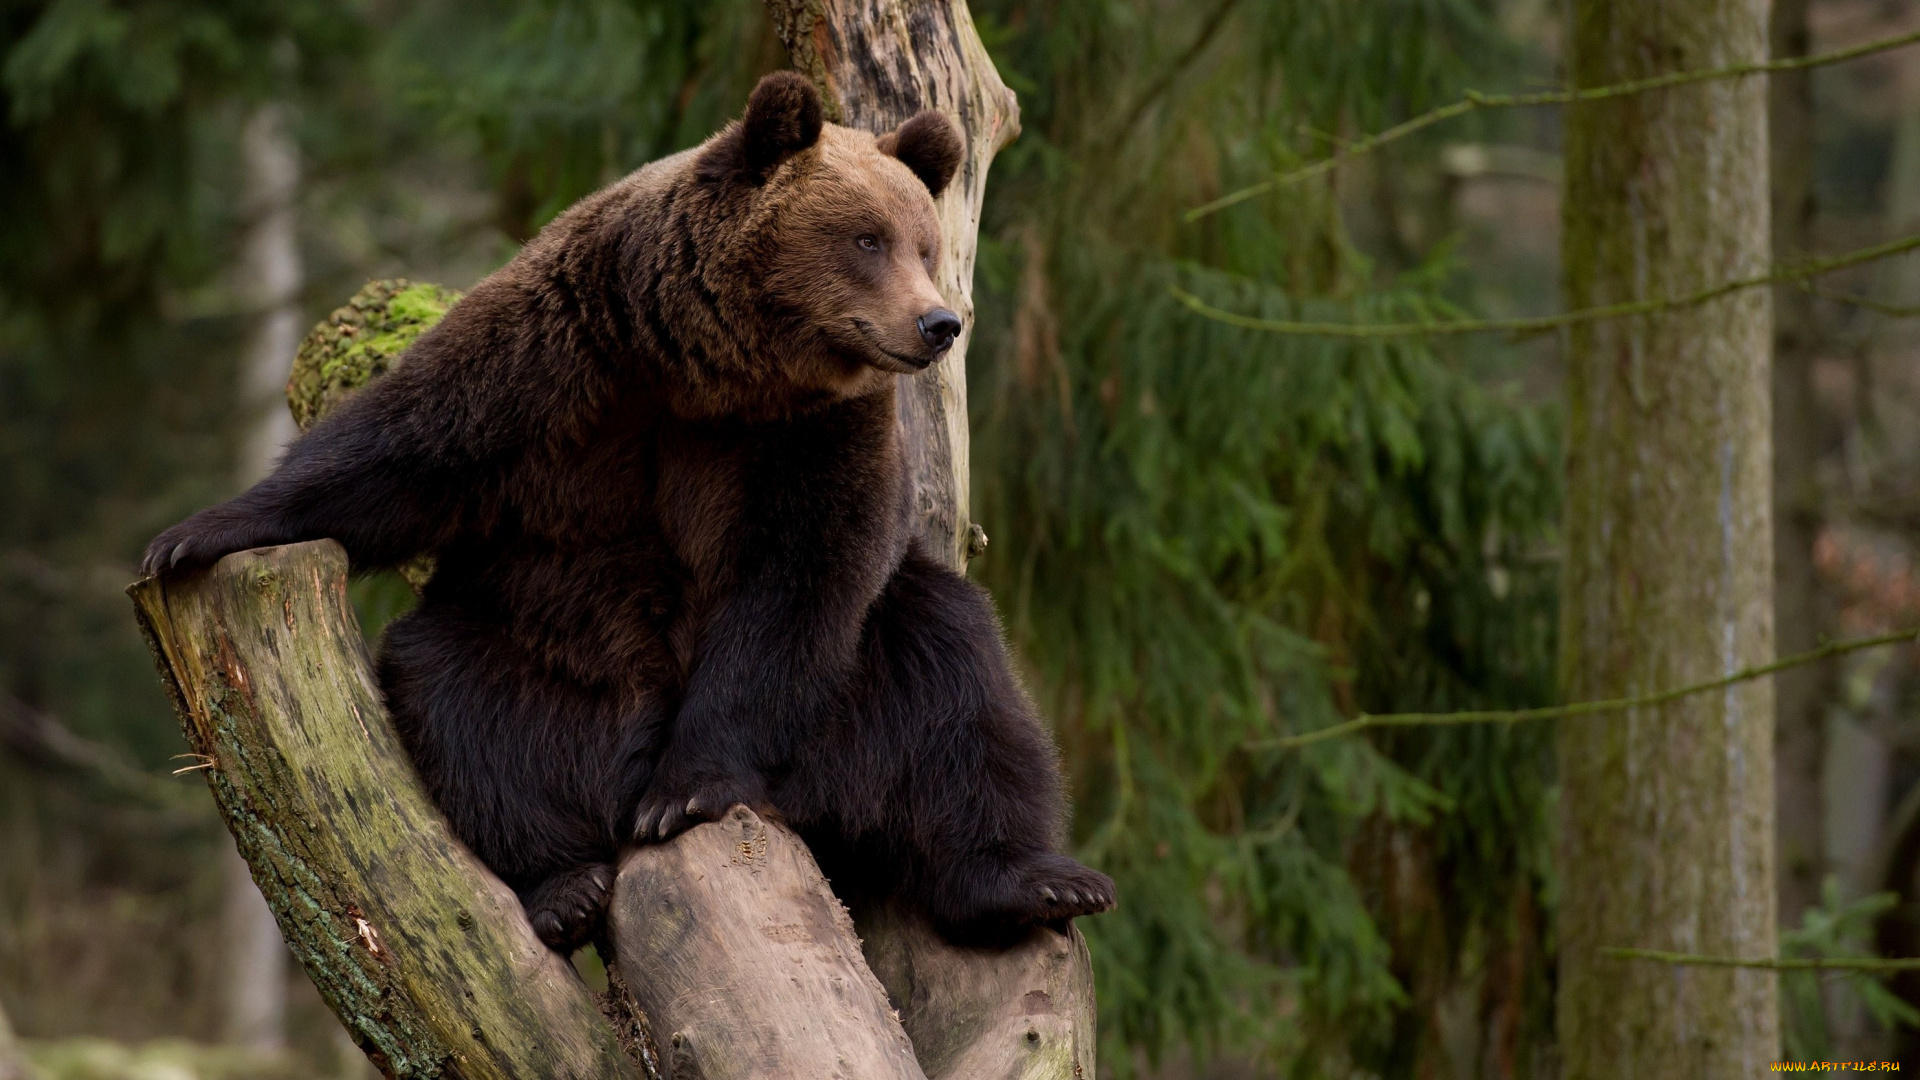 Спящий на бревне медвежонок подборки